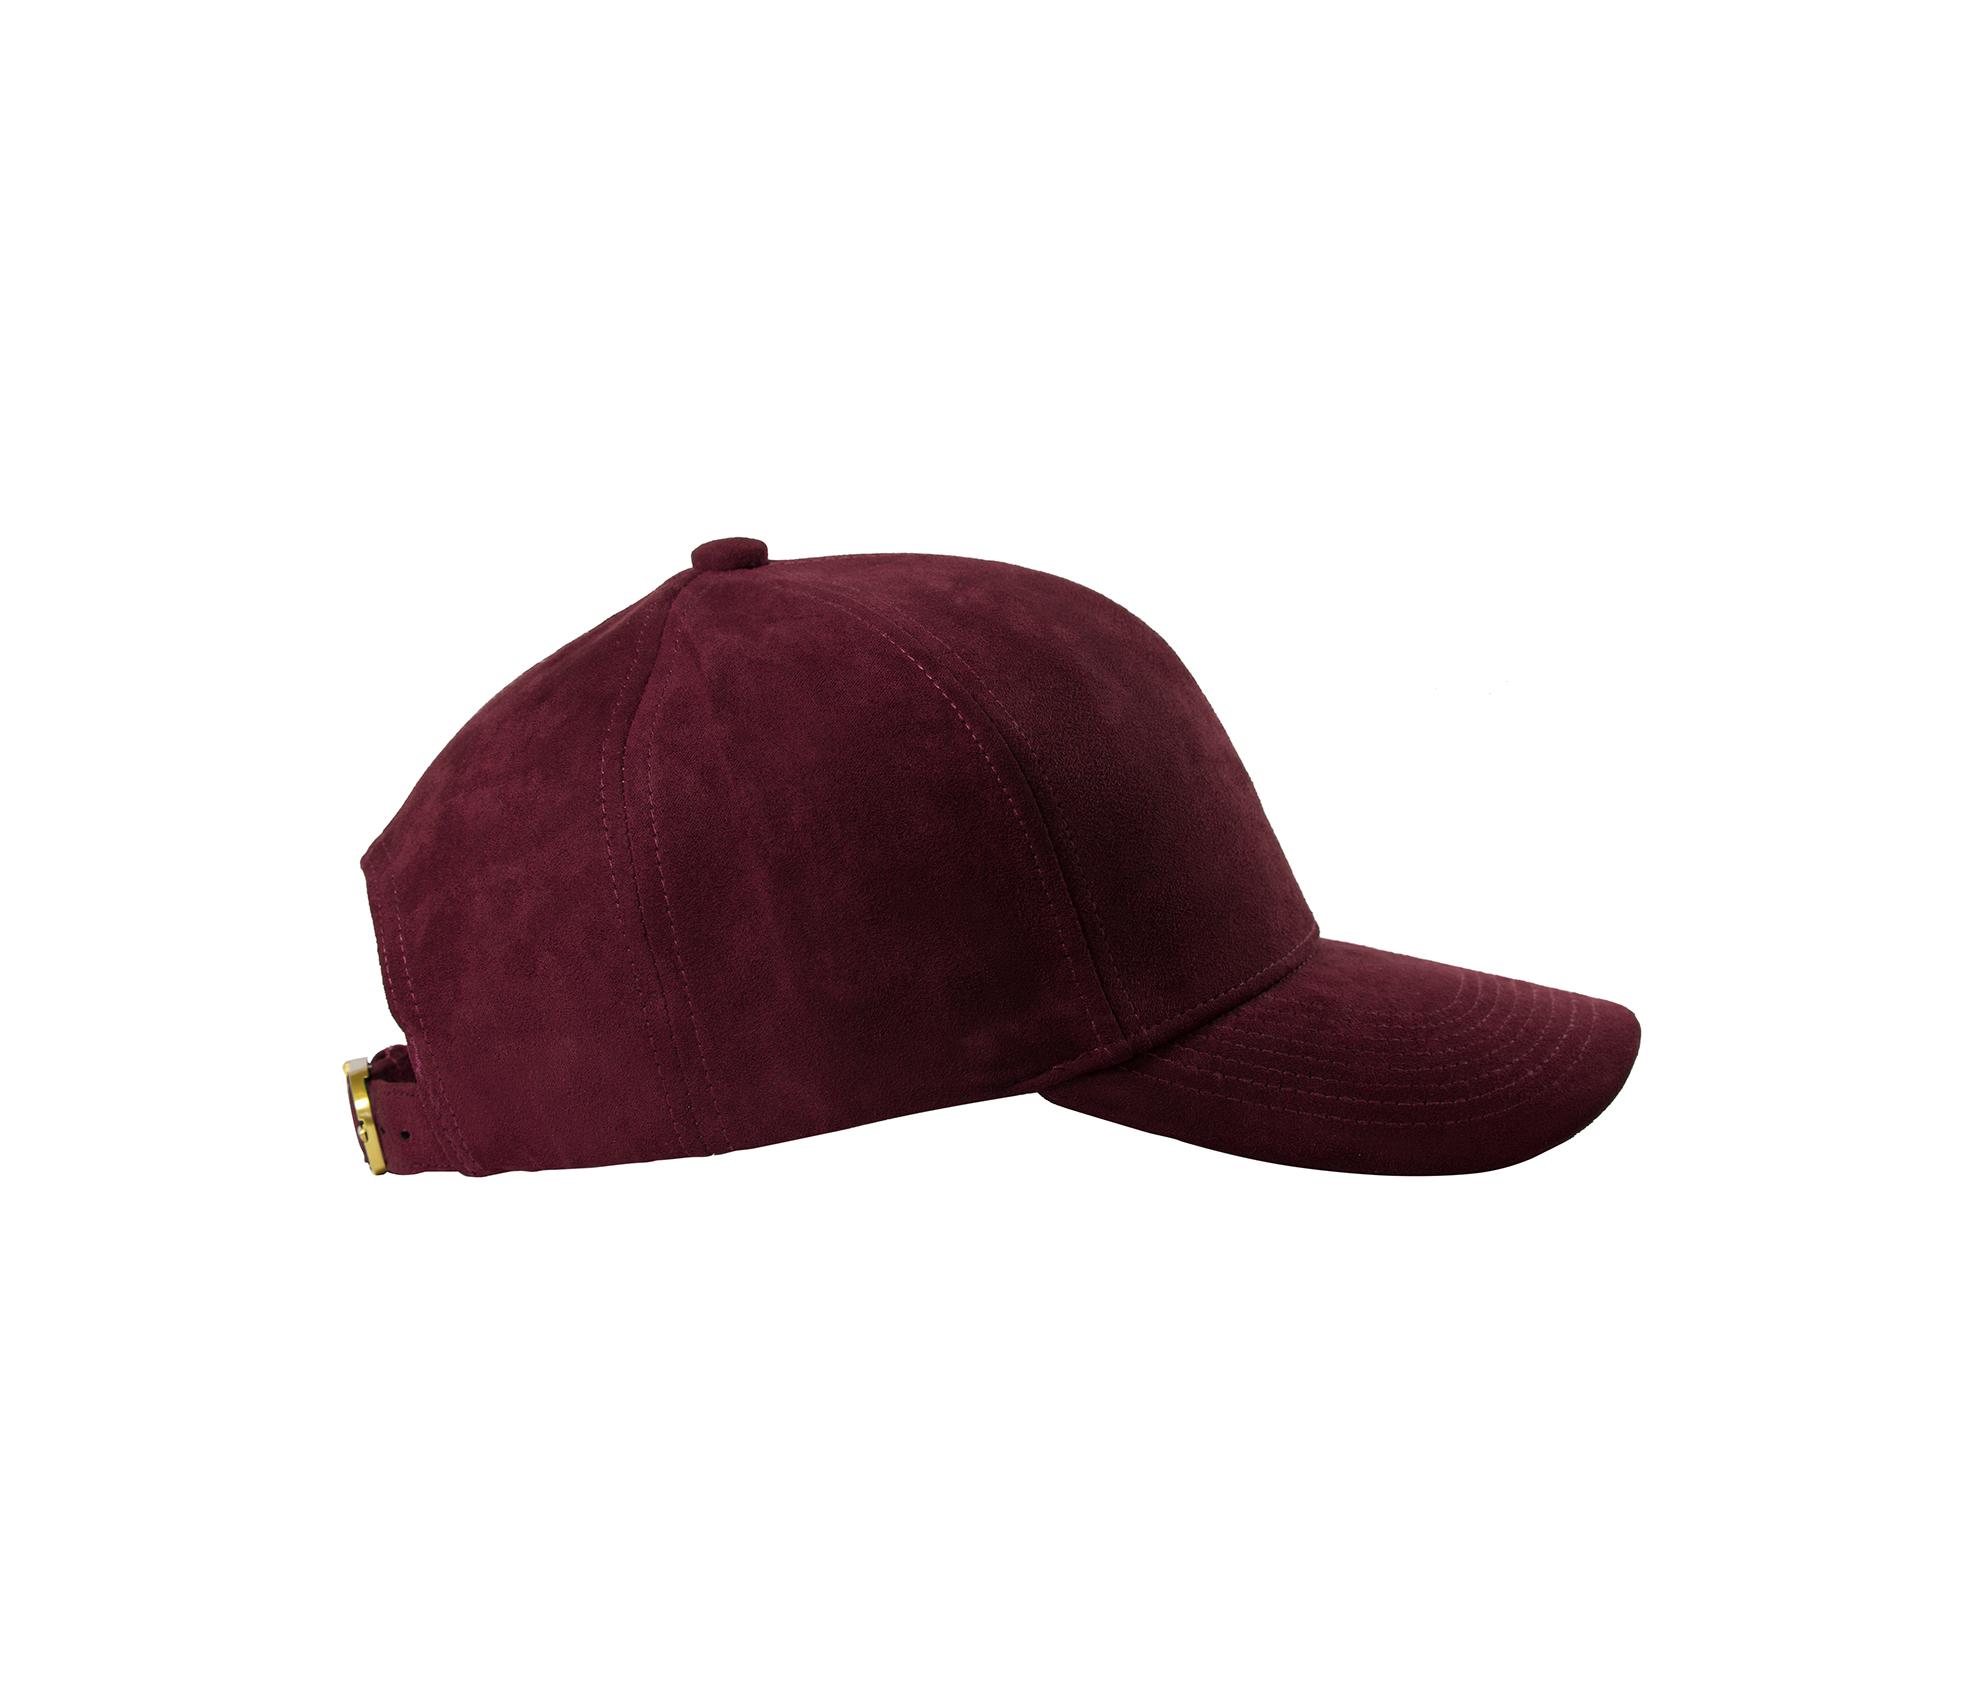 BASEBALL CAP BORDEAUX GOLD SUEDE SIDE